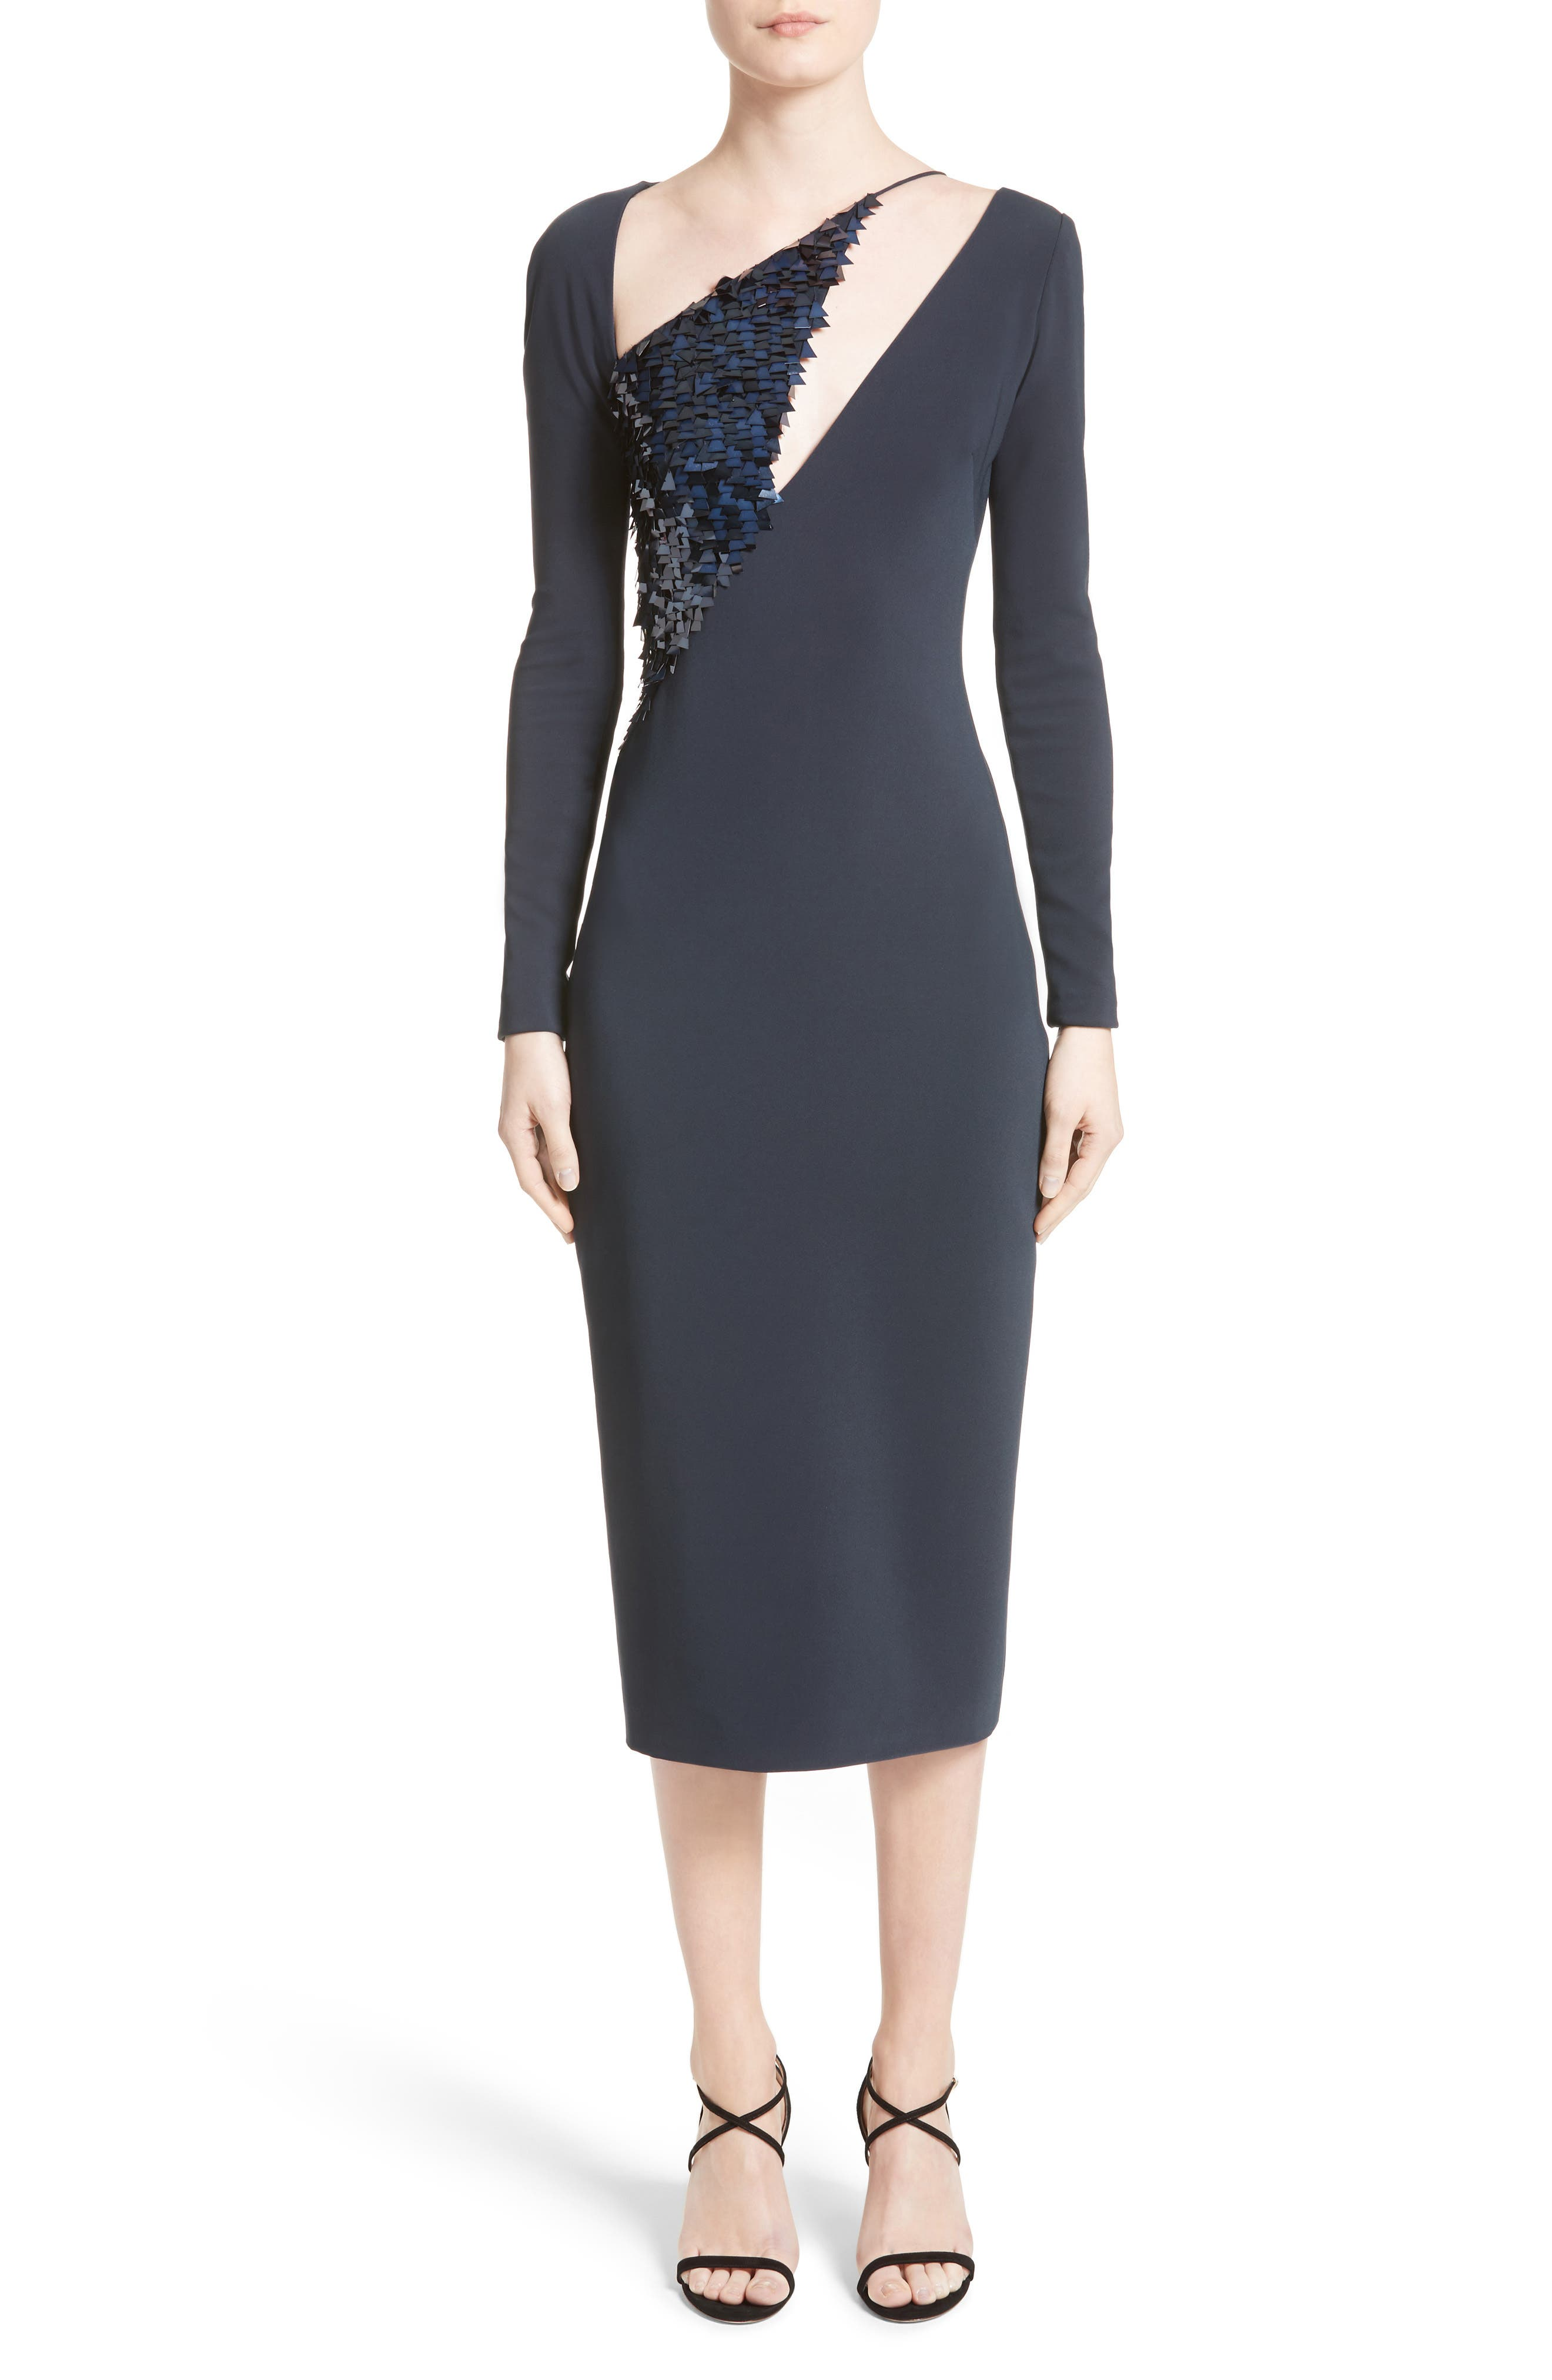 Alternate Image 1 Selected - Cushnie et Ochs Larissa Sequin Pencil Dress